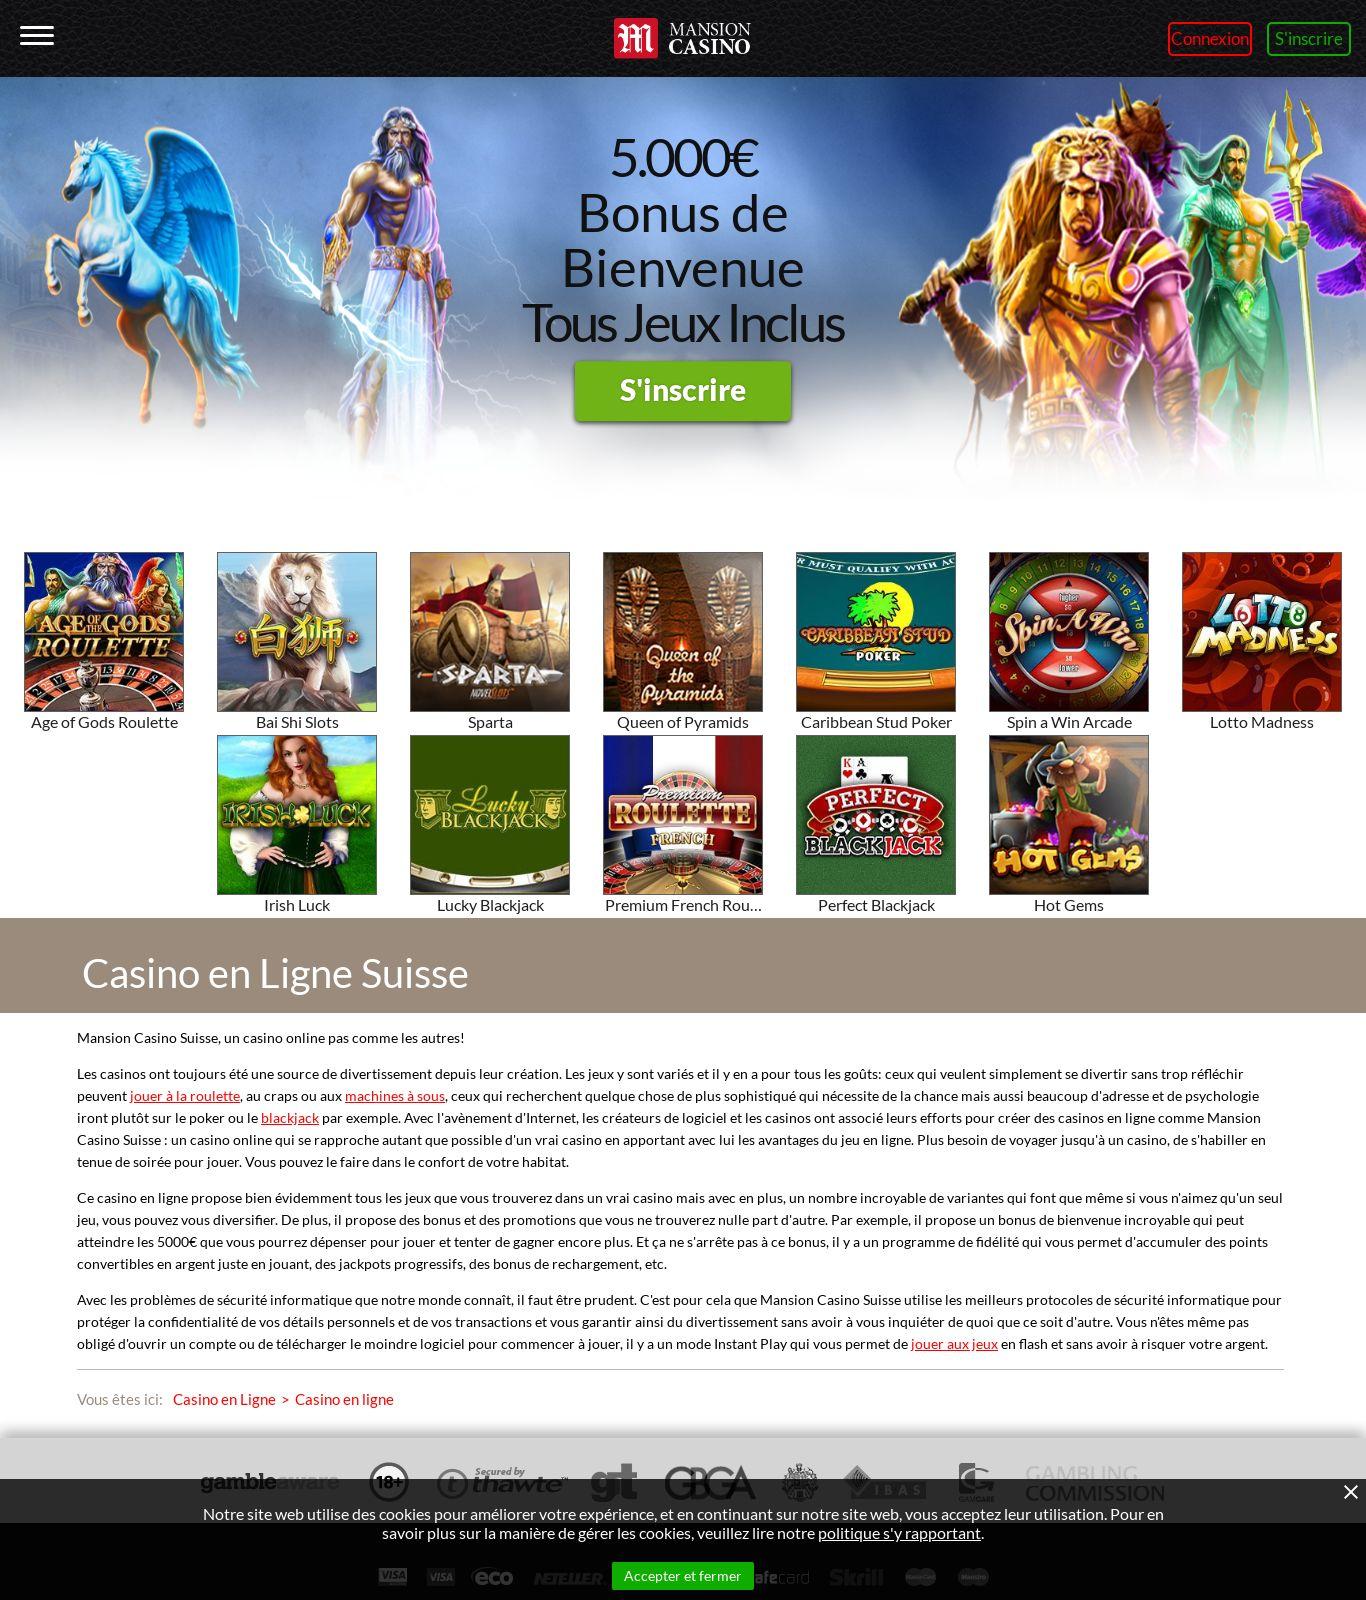 Glücksspiel Chance Prestige - 397499